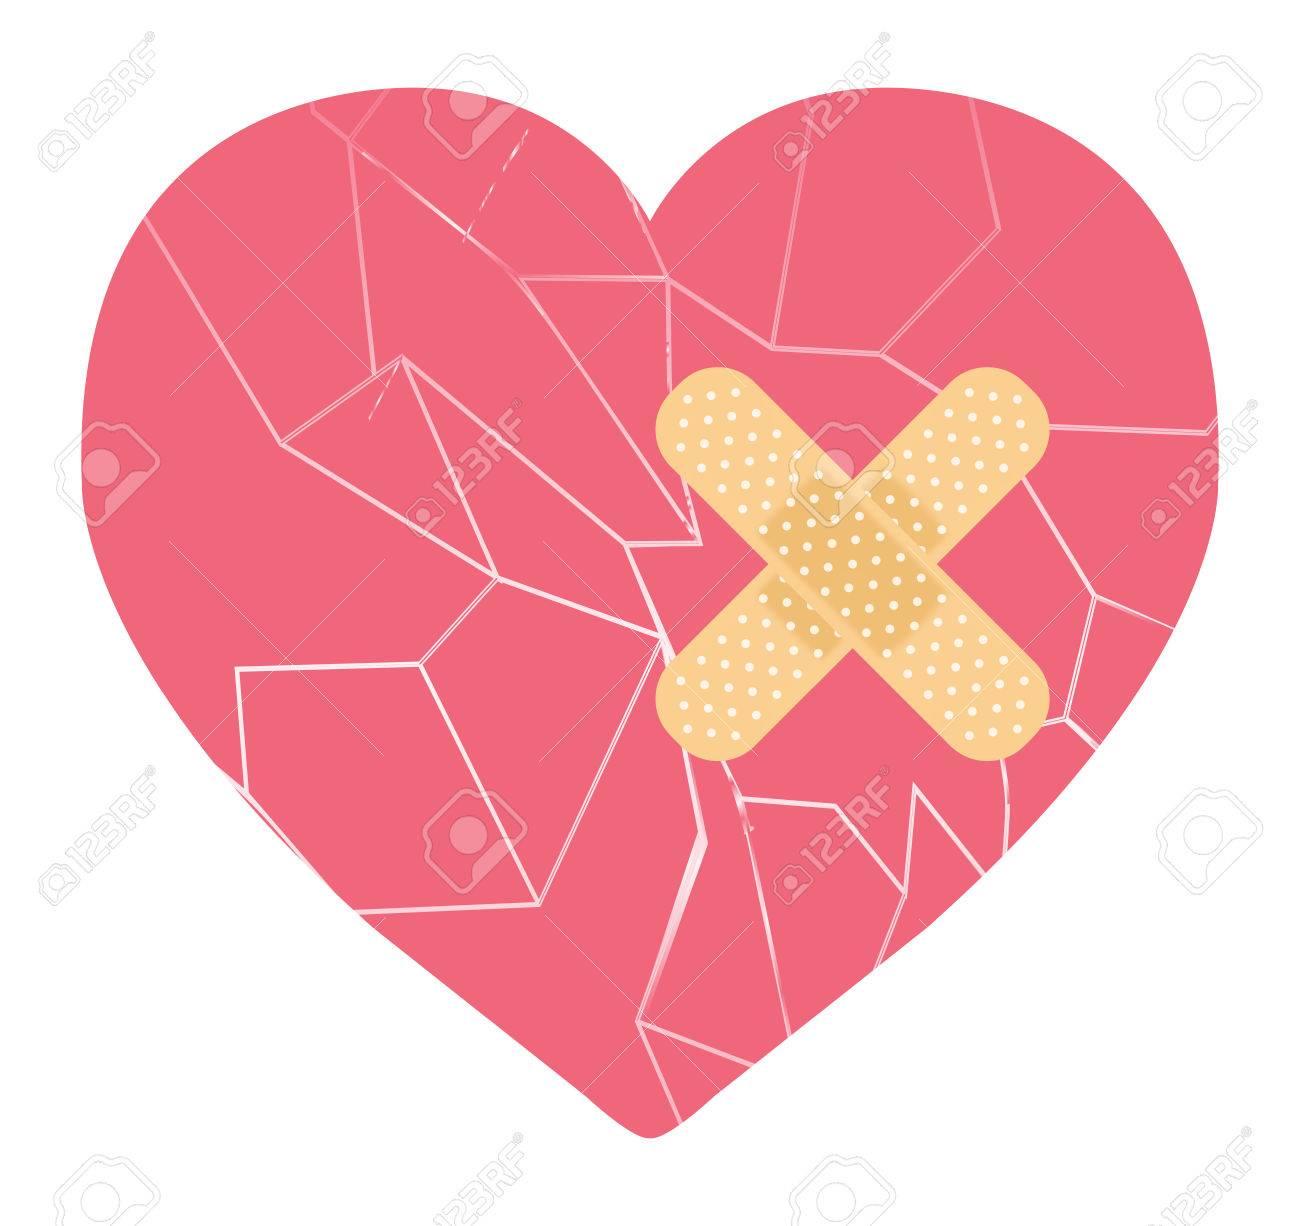 broken heart with bandage.